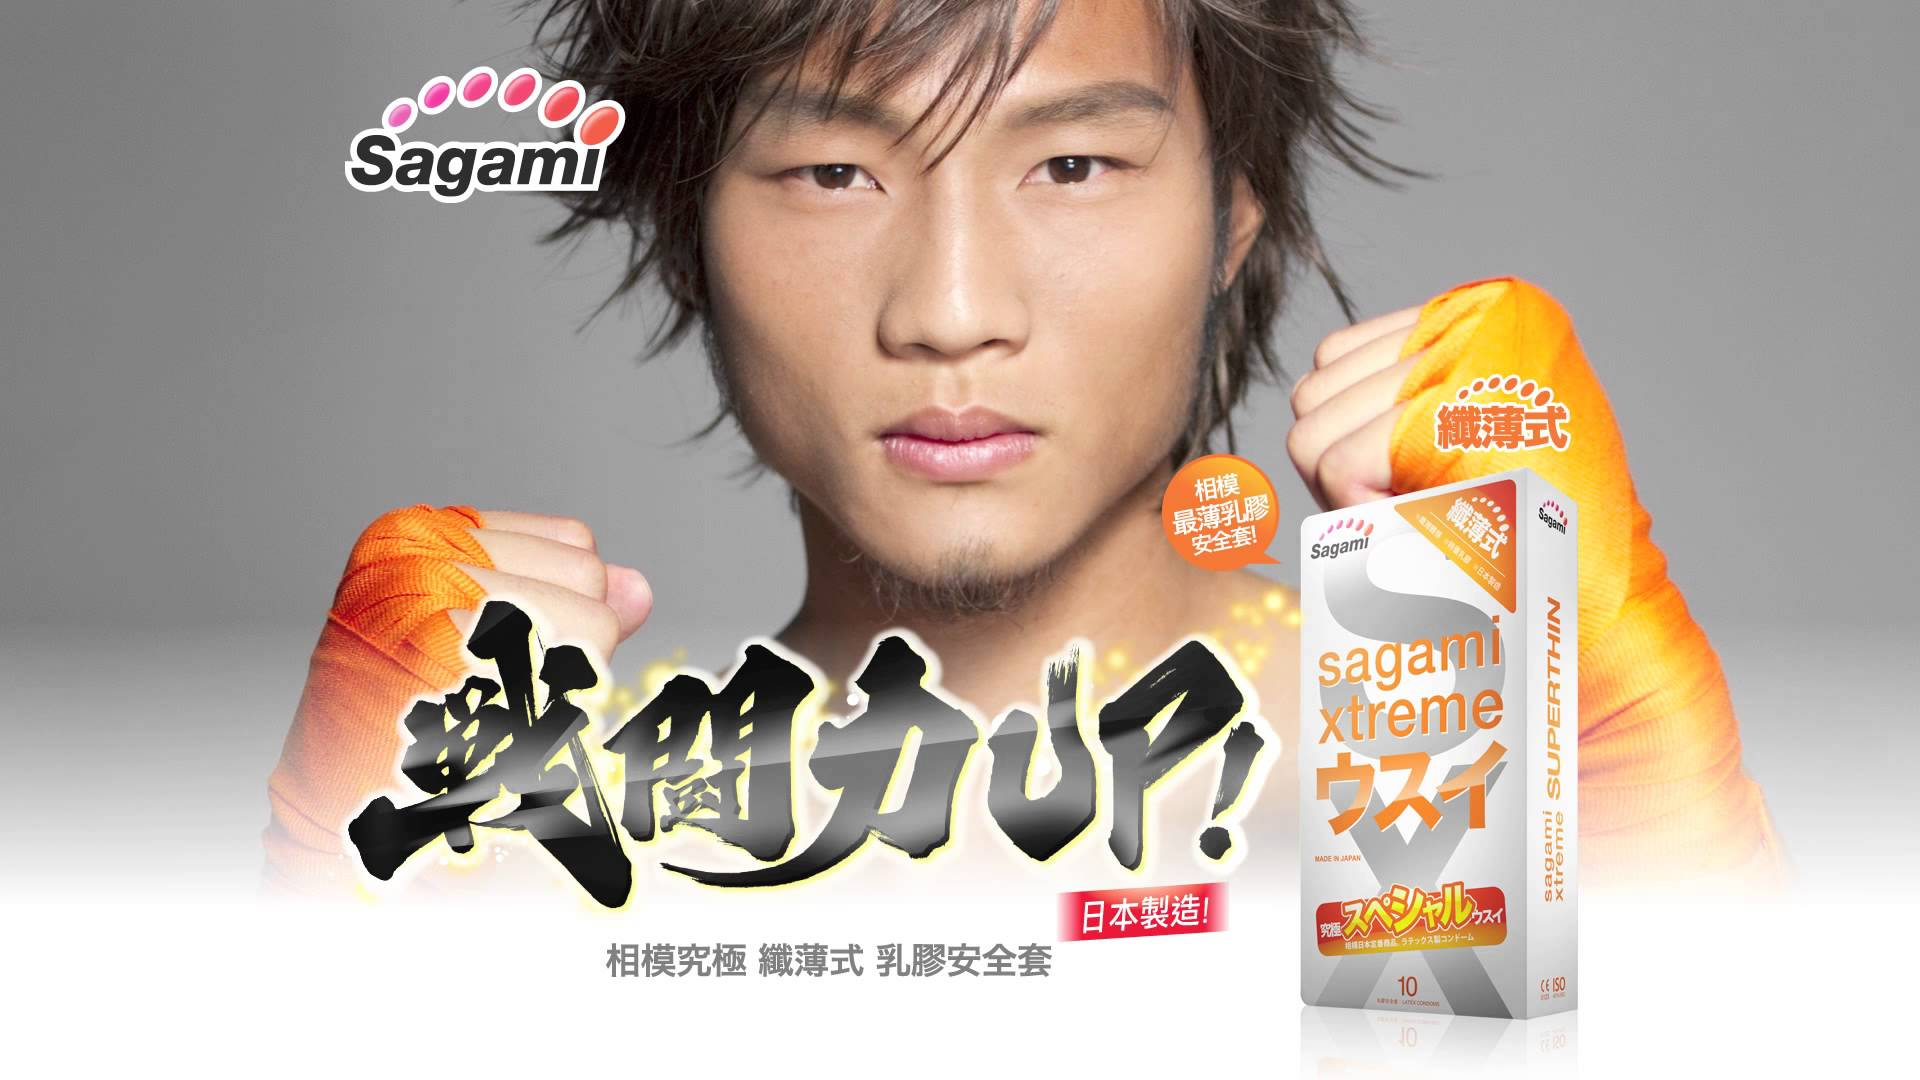 20180503211213 6461713 sagami super thin hai phong gia re - Bao cao su Sagami Xtreme Super Thin - Siêu mỏng hộp 10 cái